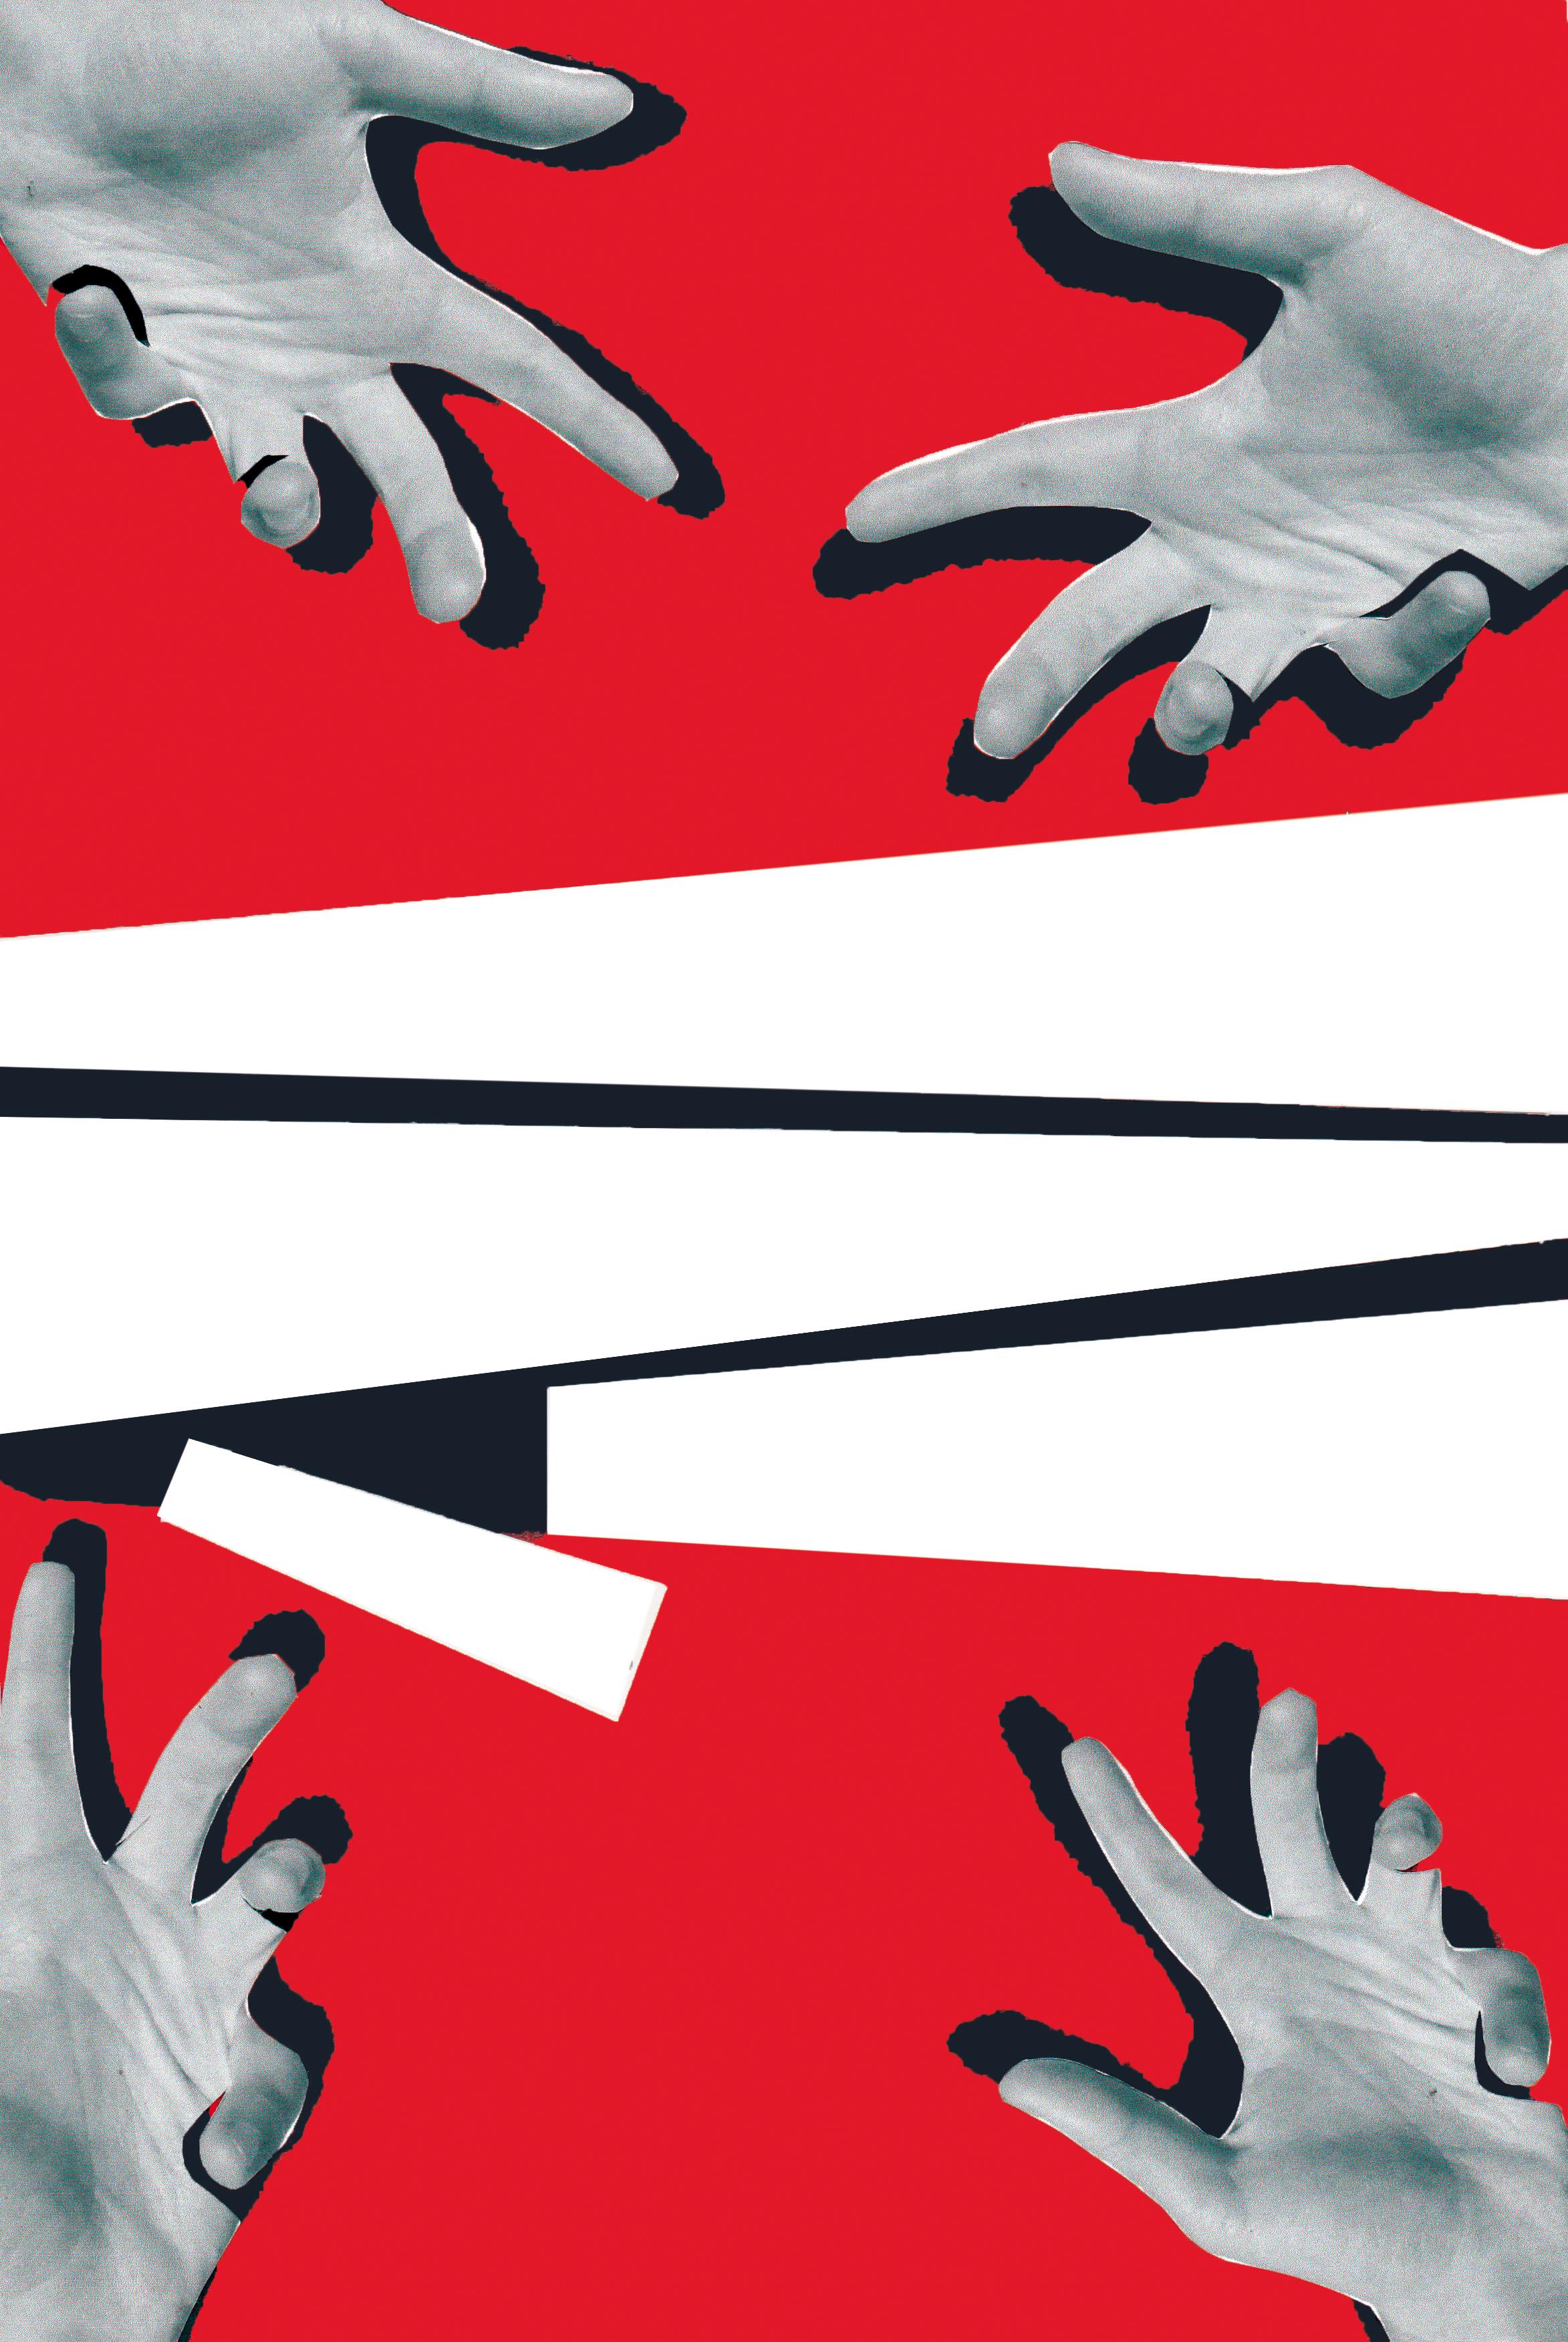 Marcos Carrillo - Afiches Stencil y Collage